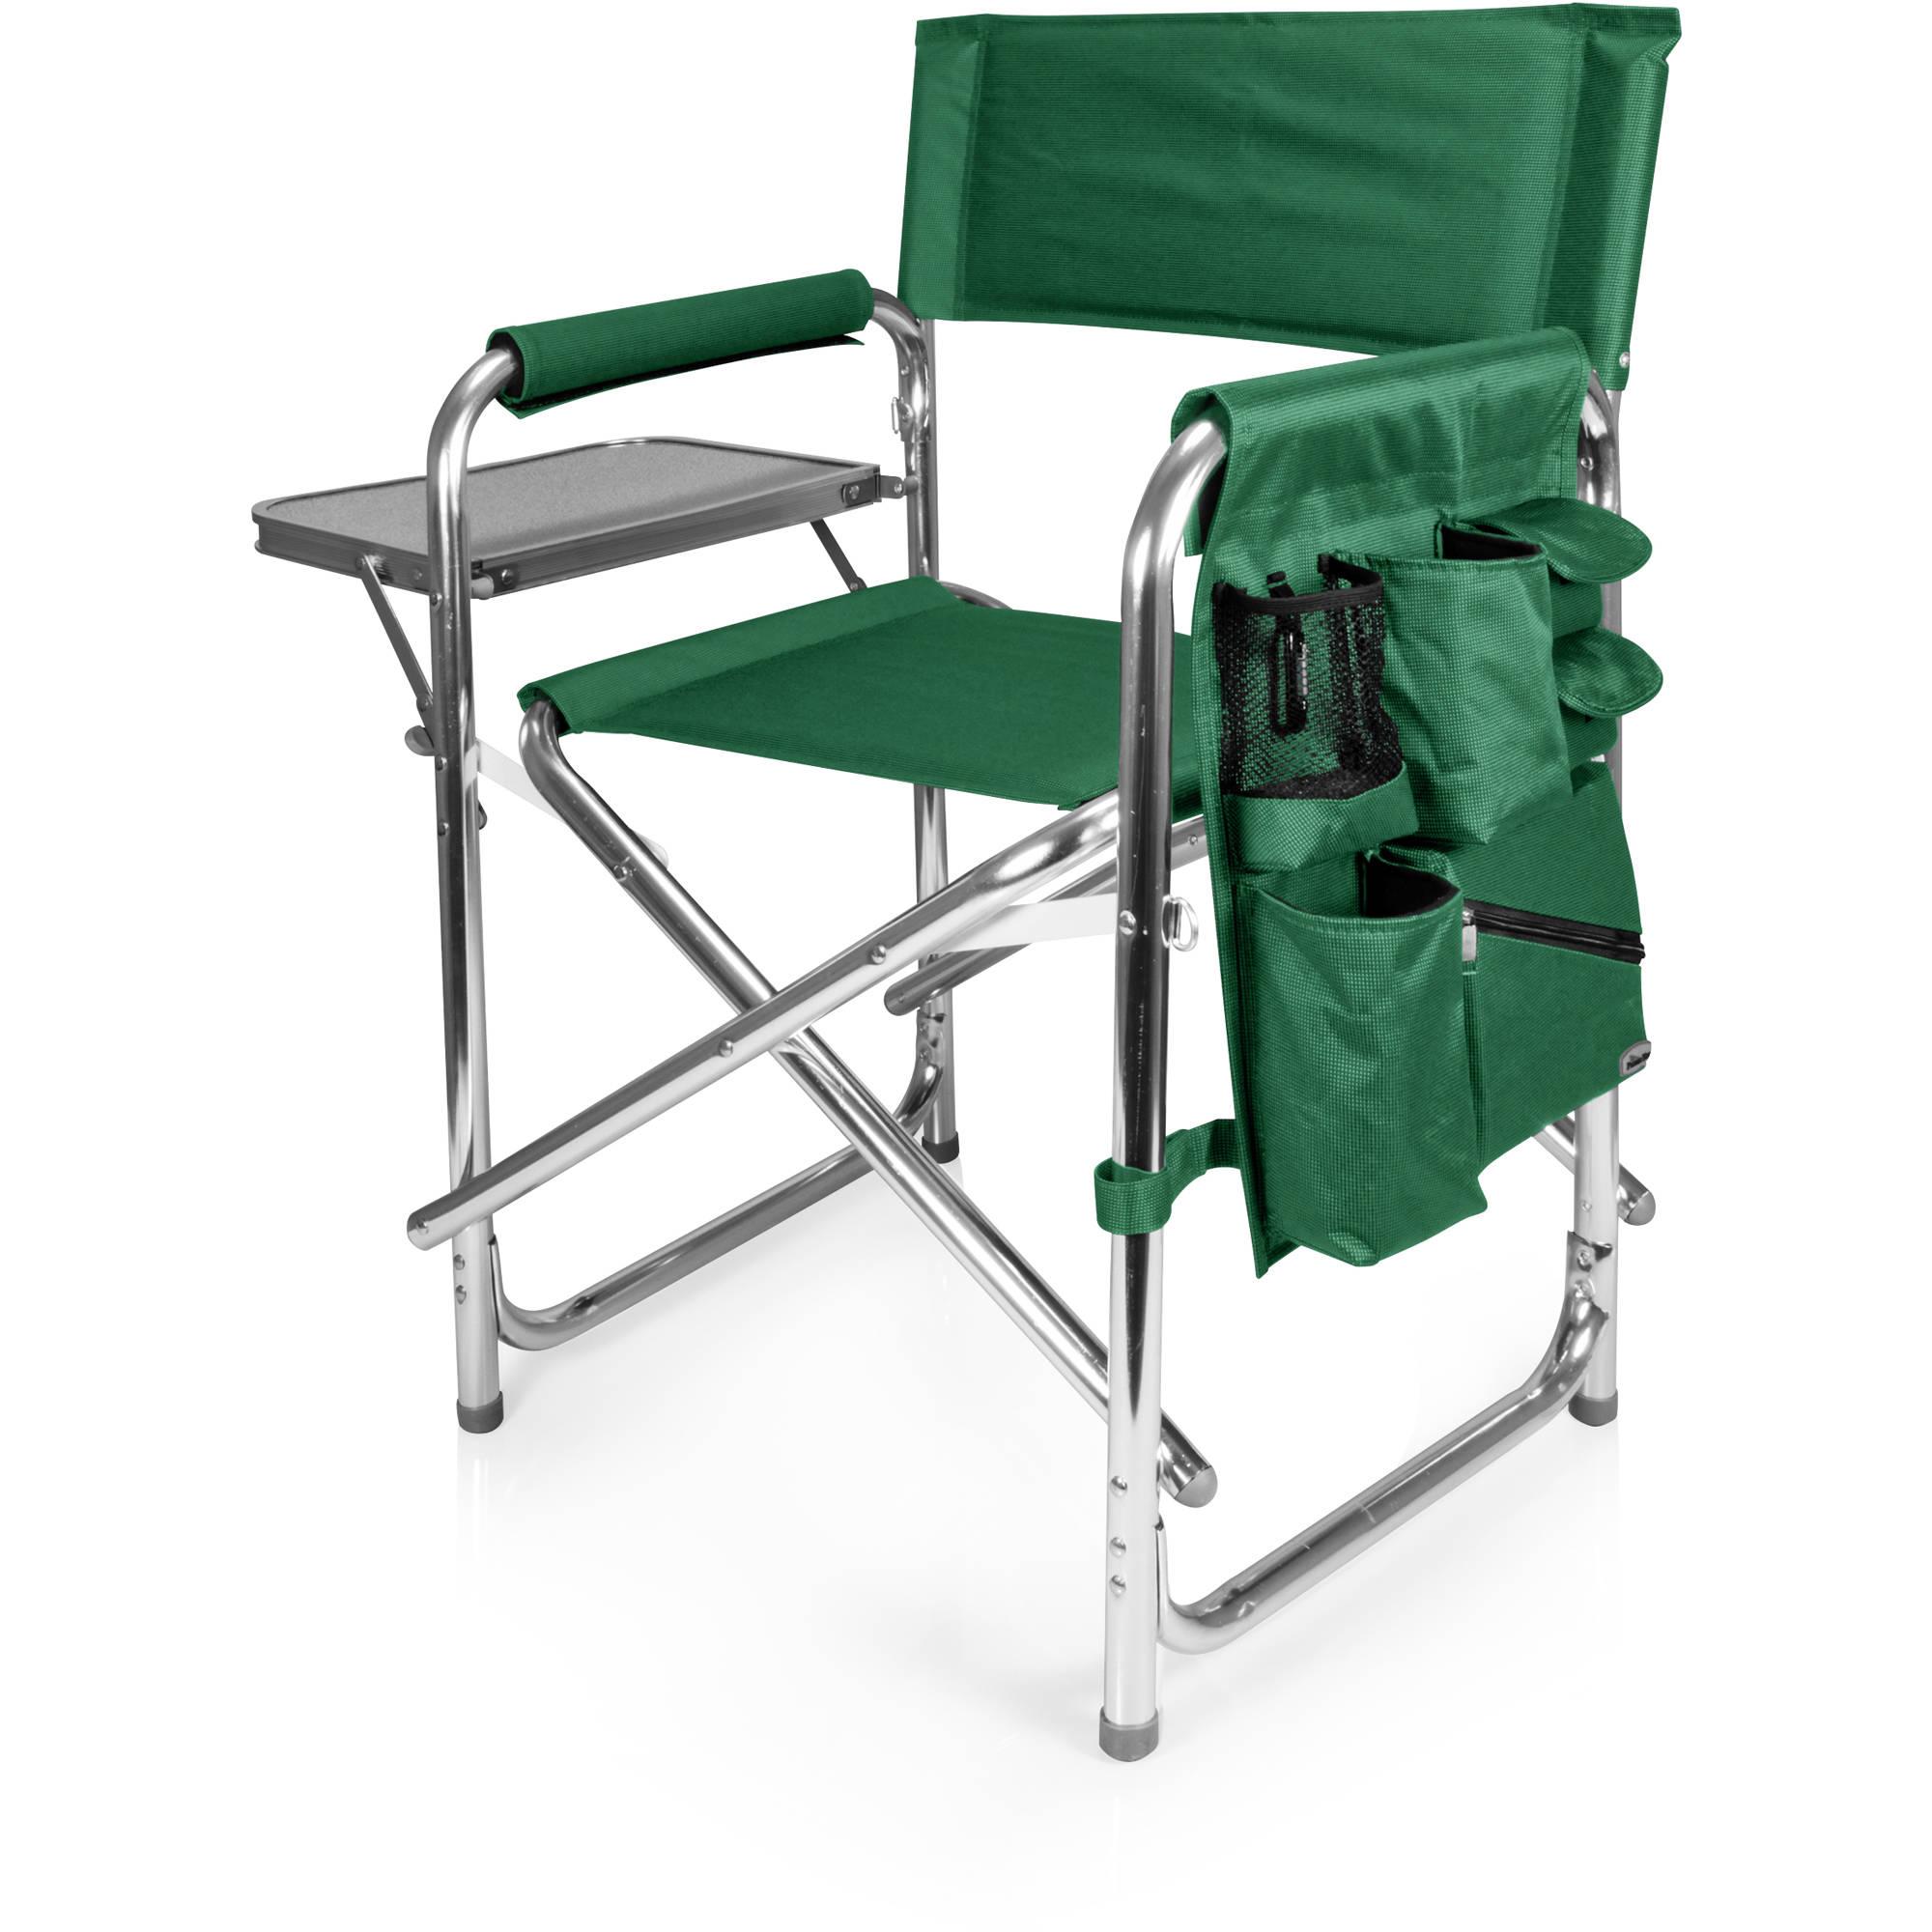 folding picnic chairs b q patio reclining chair time sports hunter 809 00 121 000 andh photo